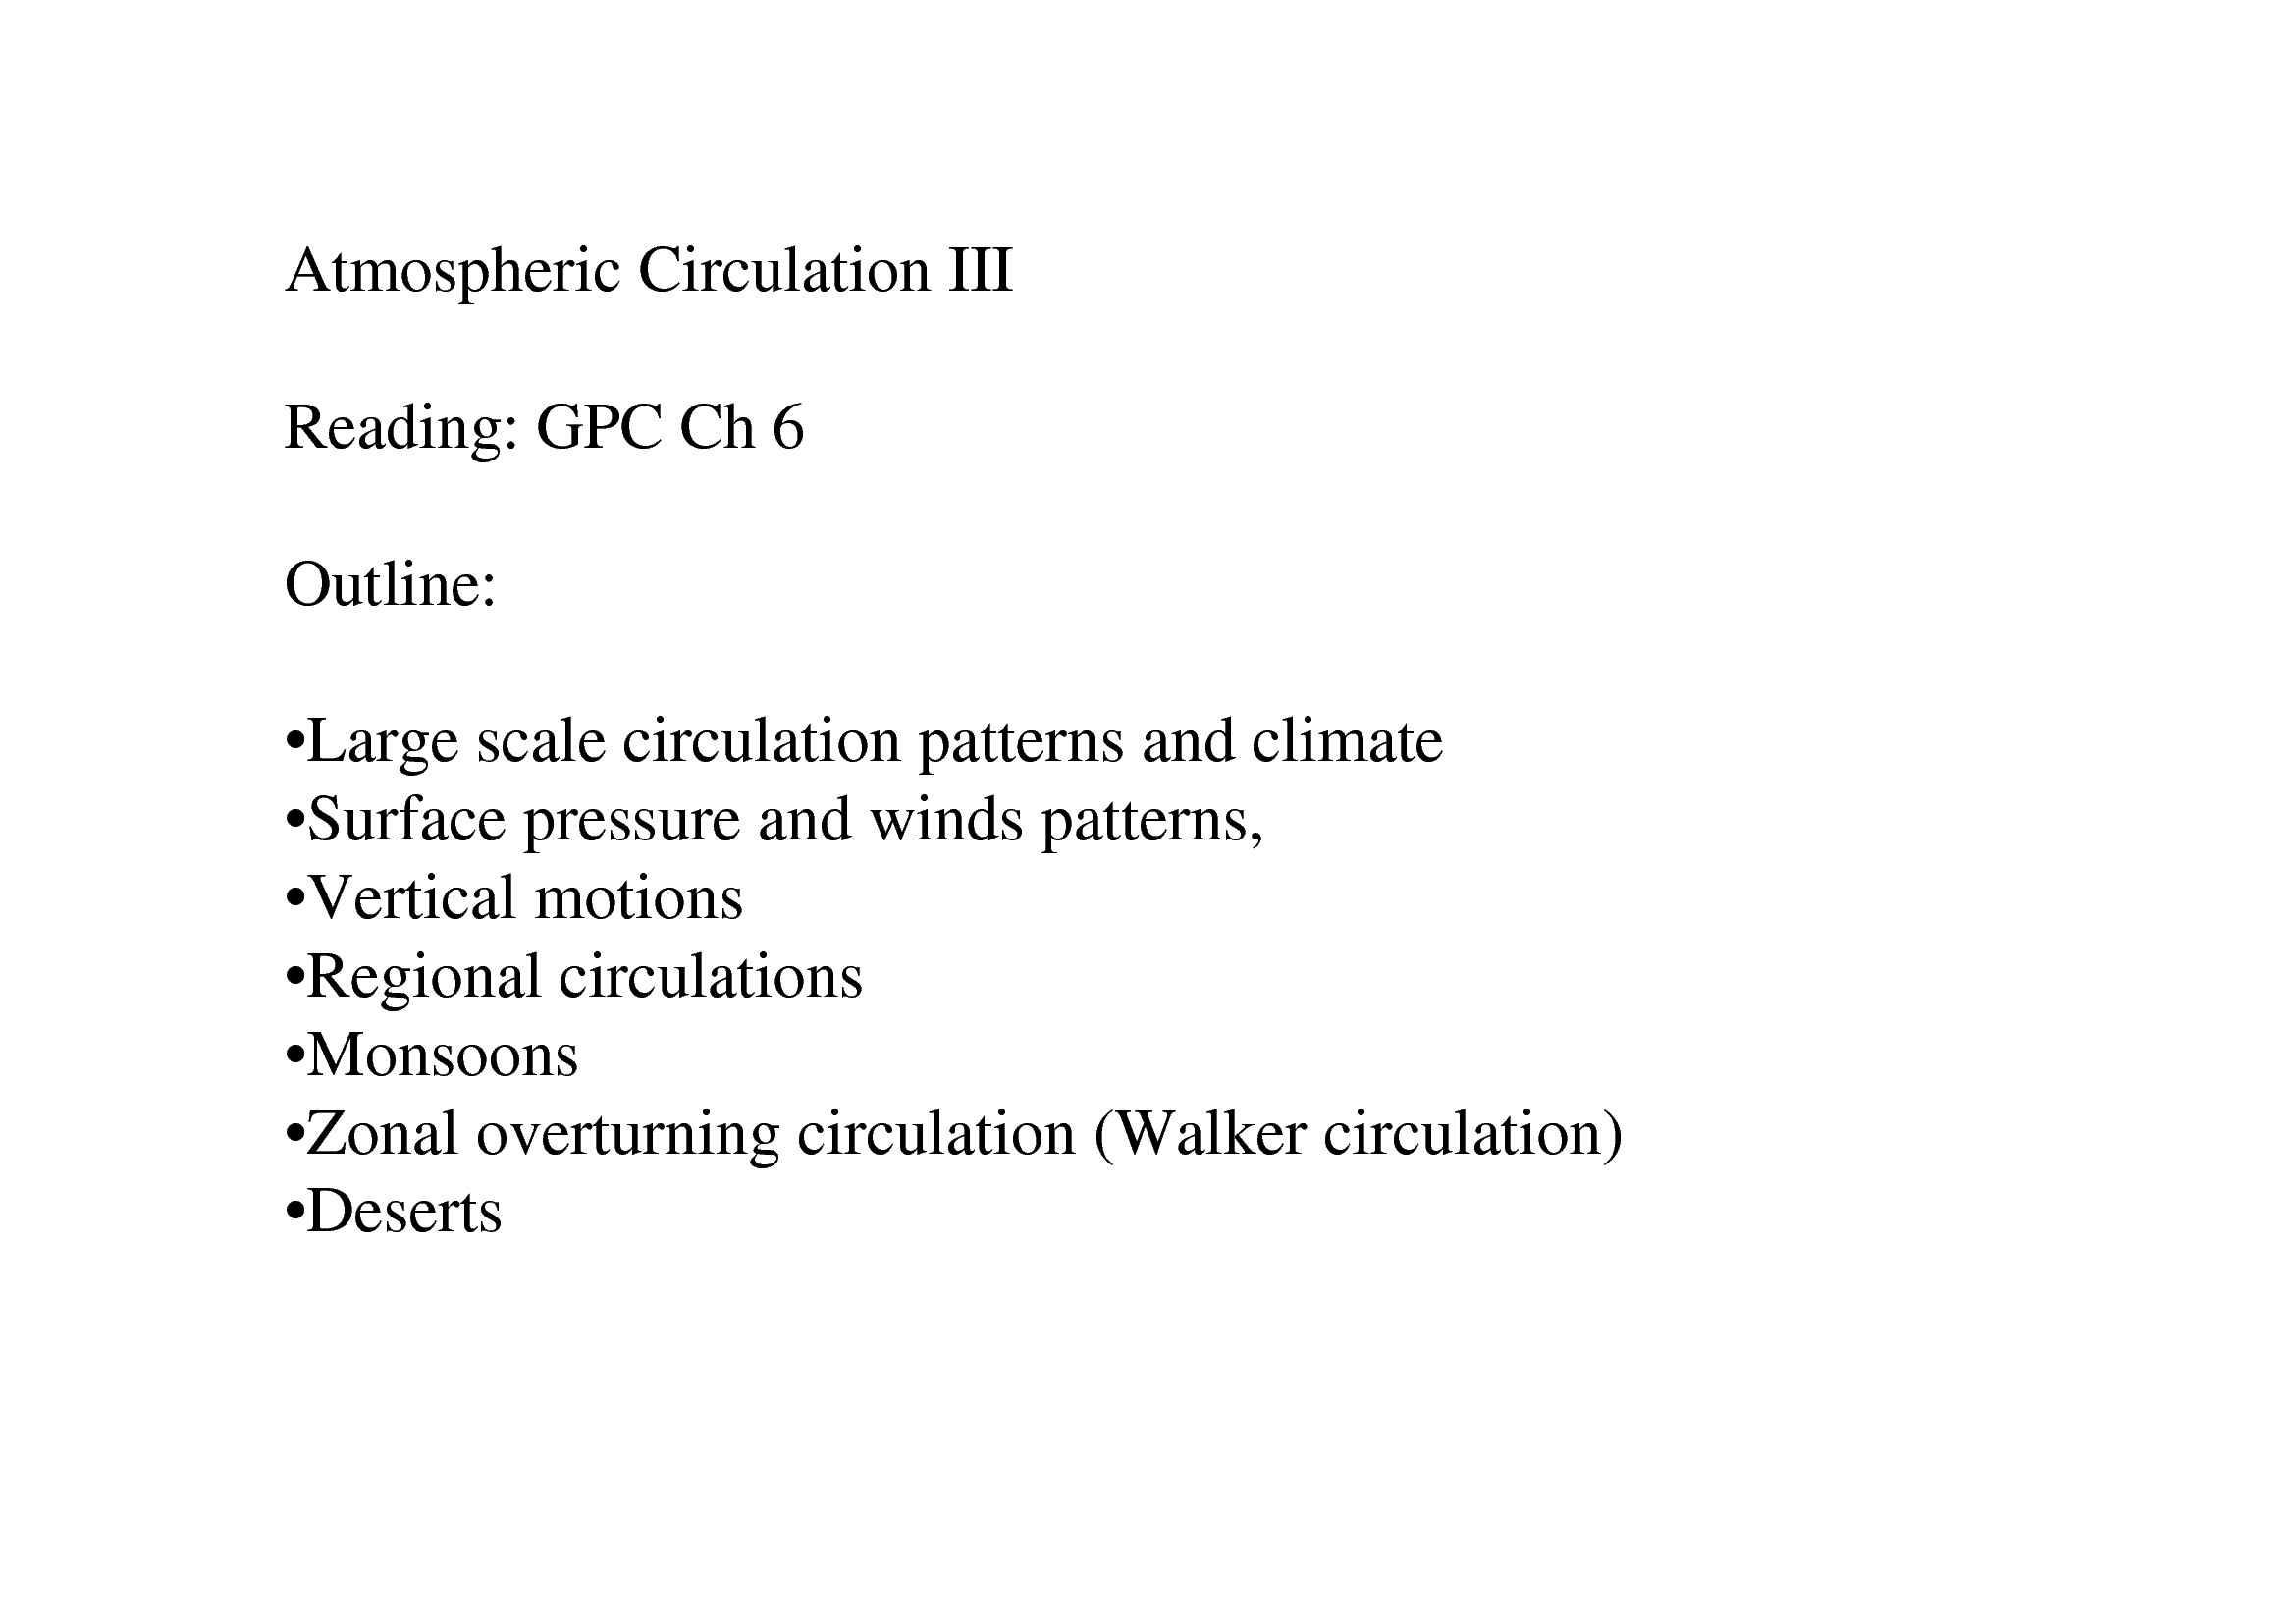 Atmospheric Circulation - Climate and Regional Circulation